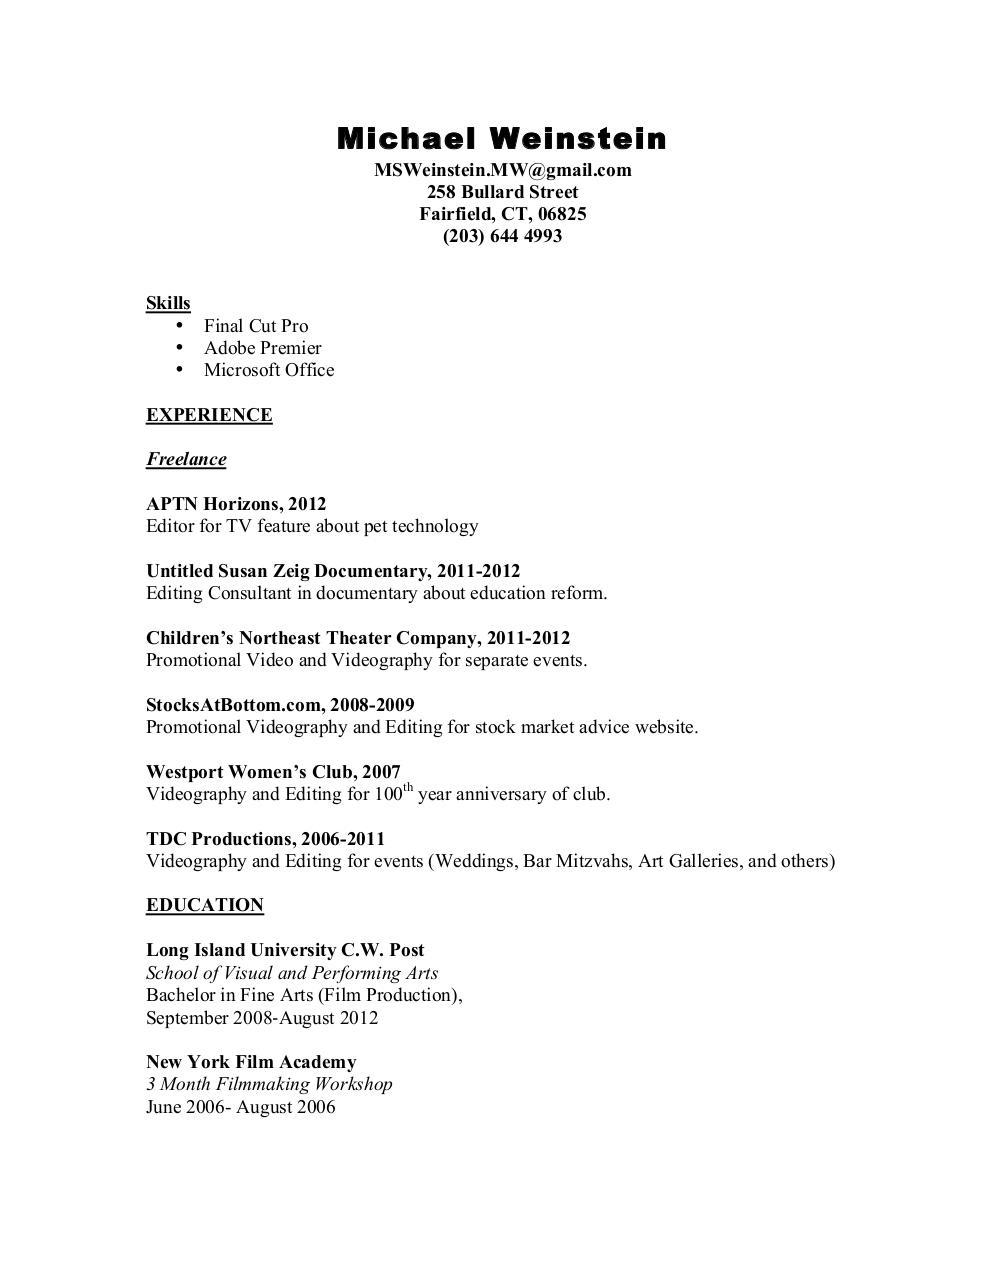 Resume .pdf - PDF Archive